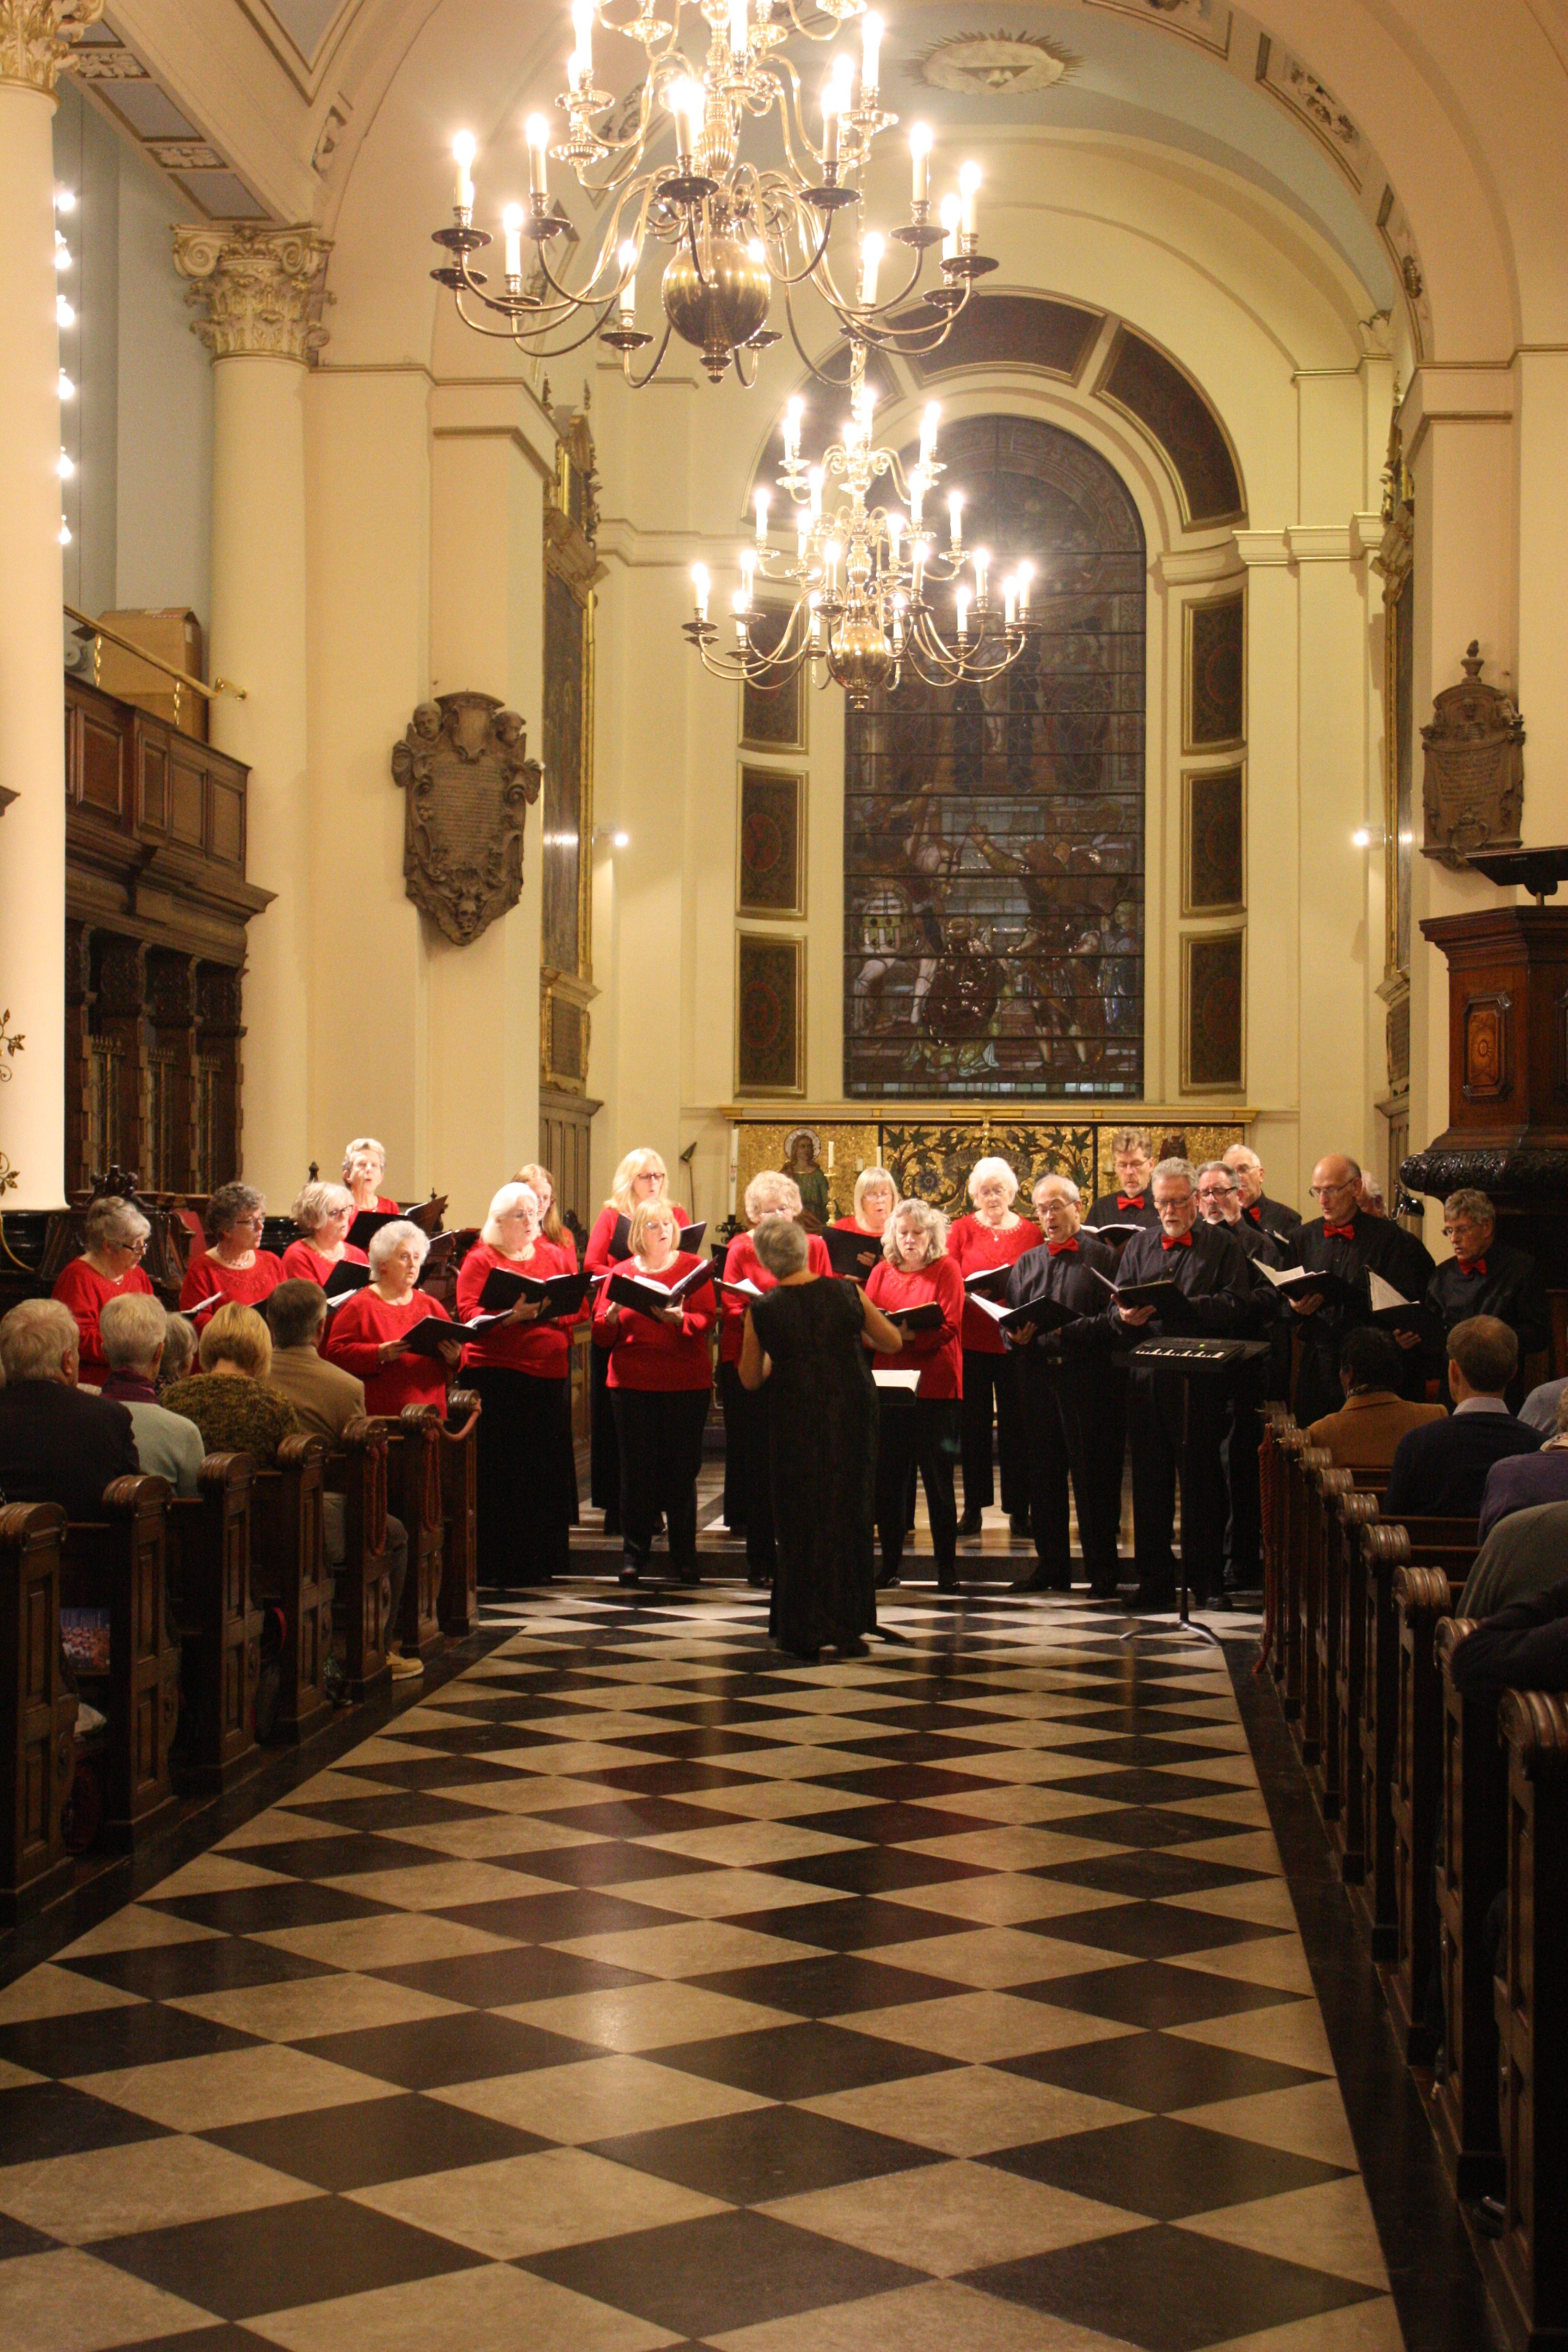 Choir Rear Portrait